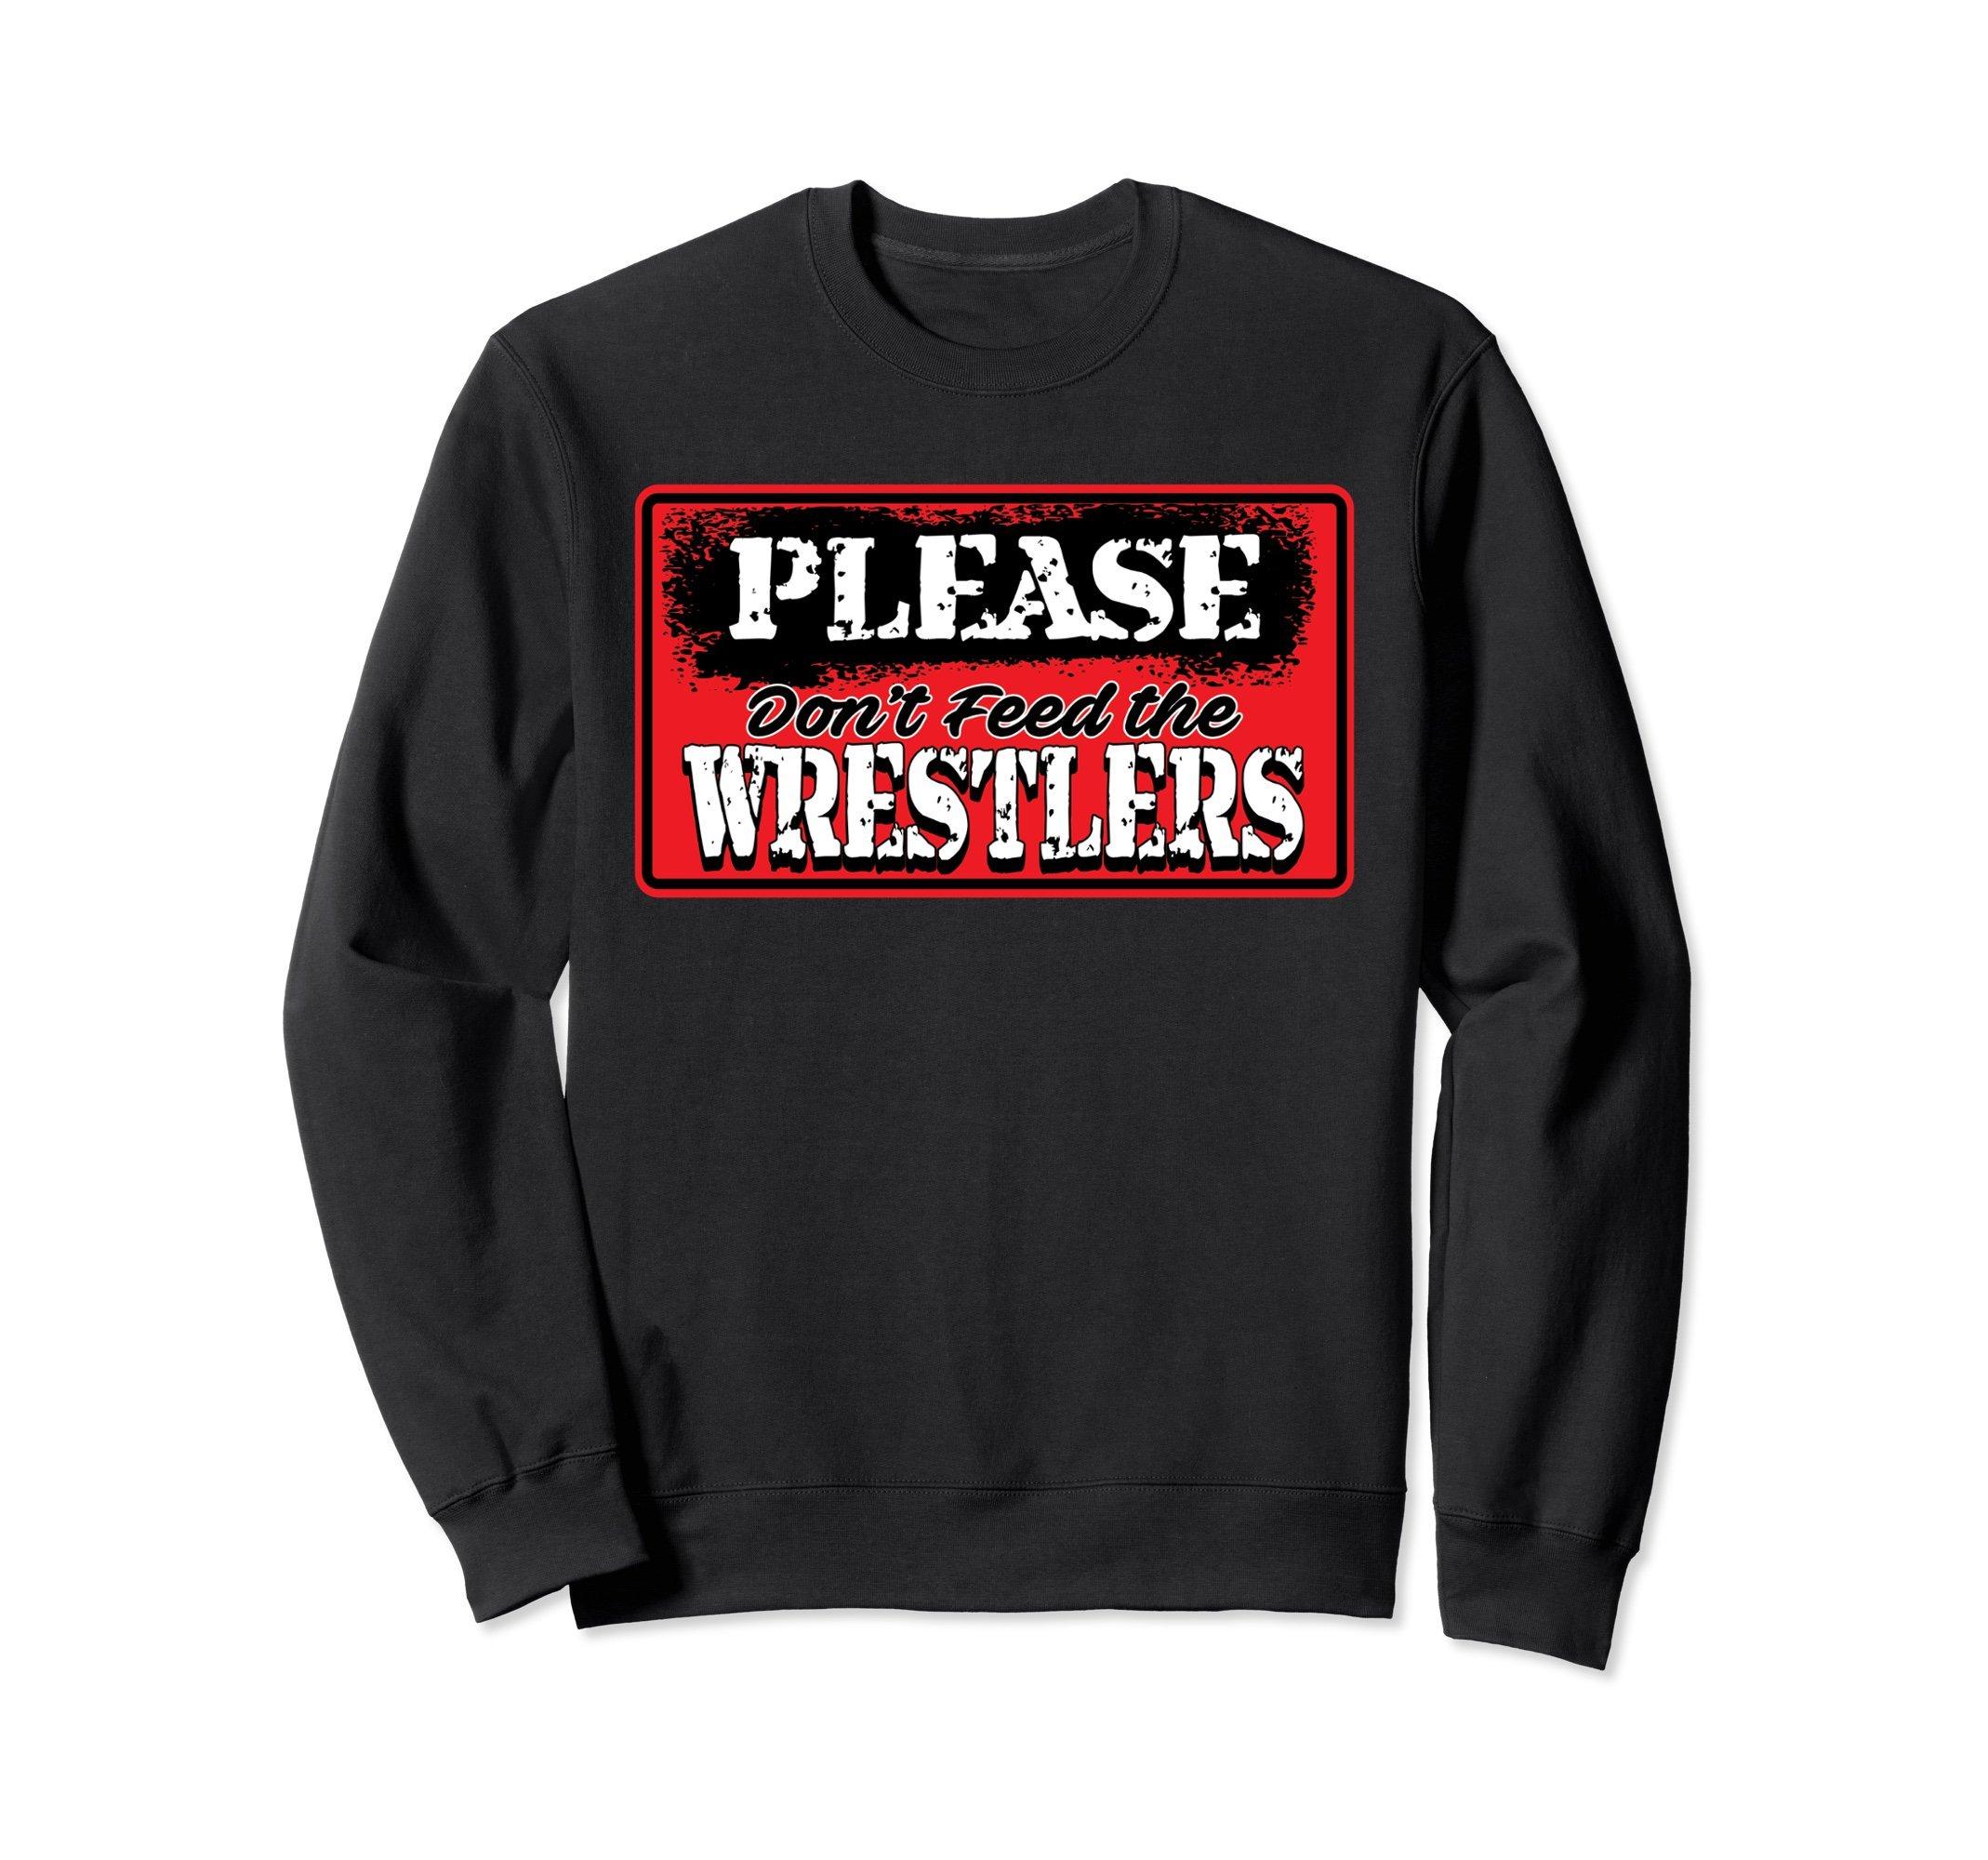 Unisex Wrestling Sweatshirt - Please Don't Feed the Wrestlers 2XL Black by Wrestling Shirt by Crush Retro